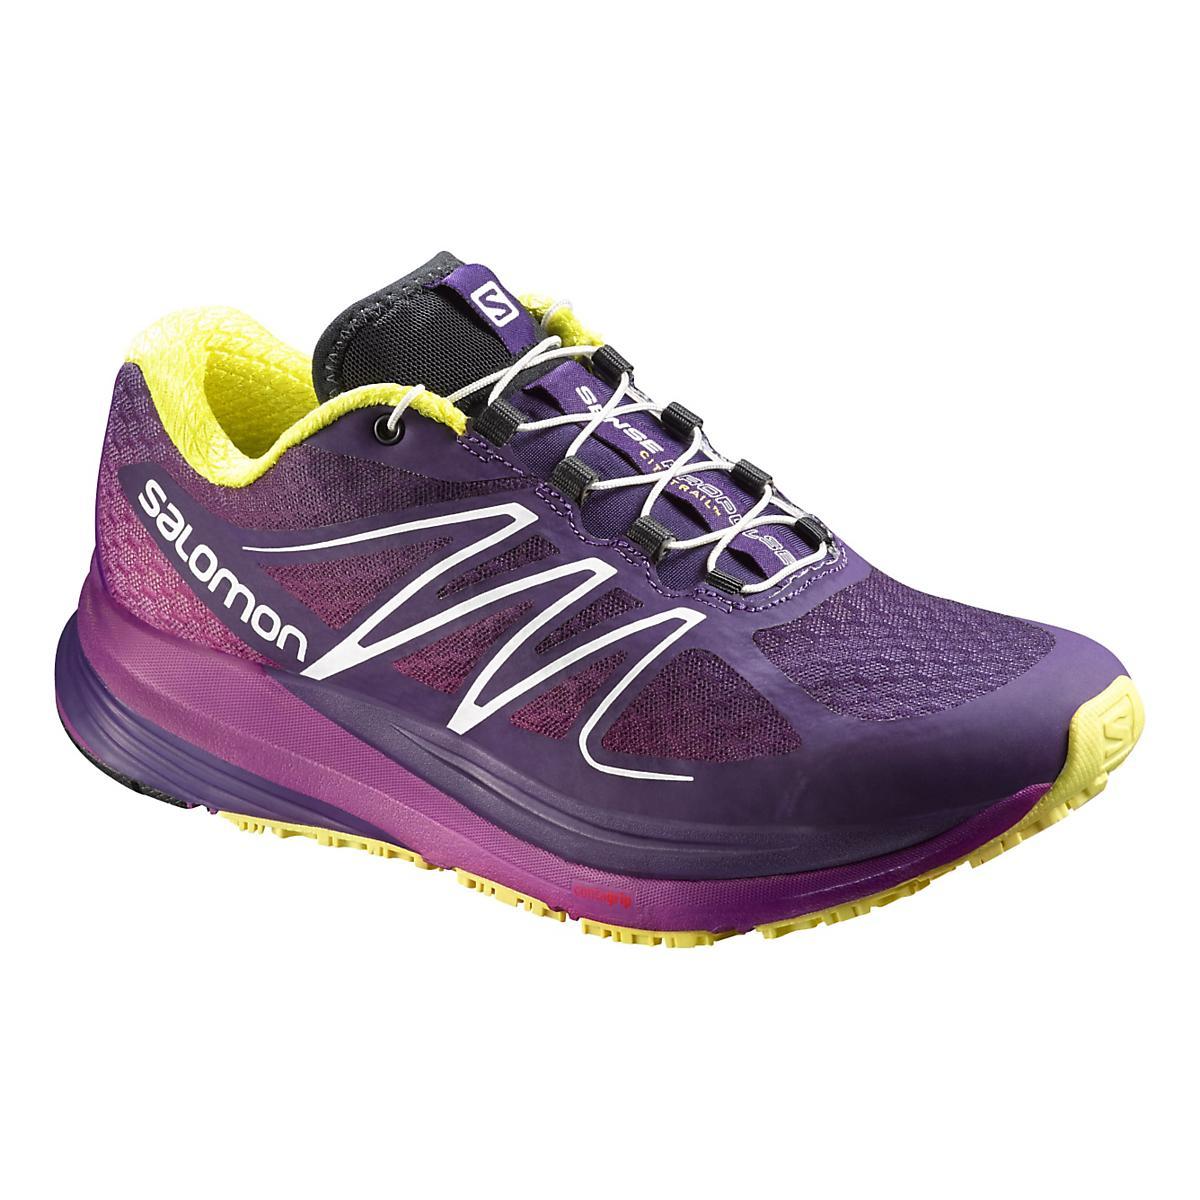 Womens Salomon Sense Propulse Trail Running Shoe at Road Runner Sports e763a5e6c7a